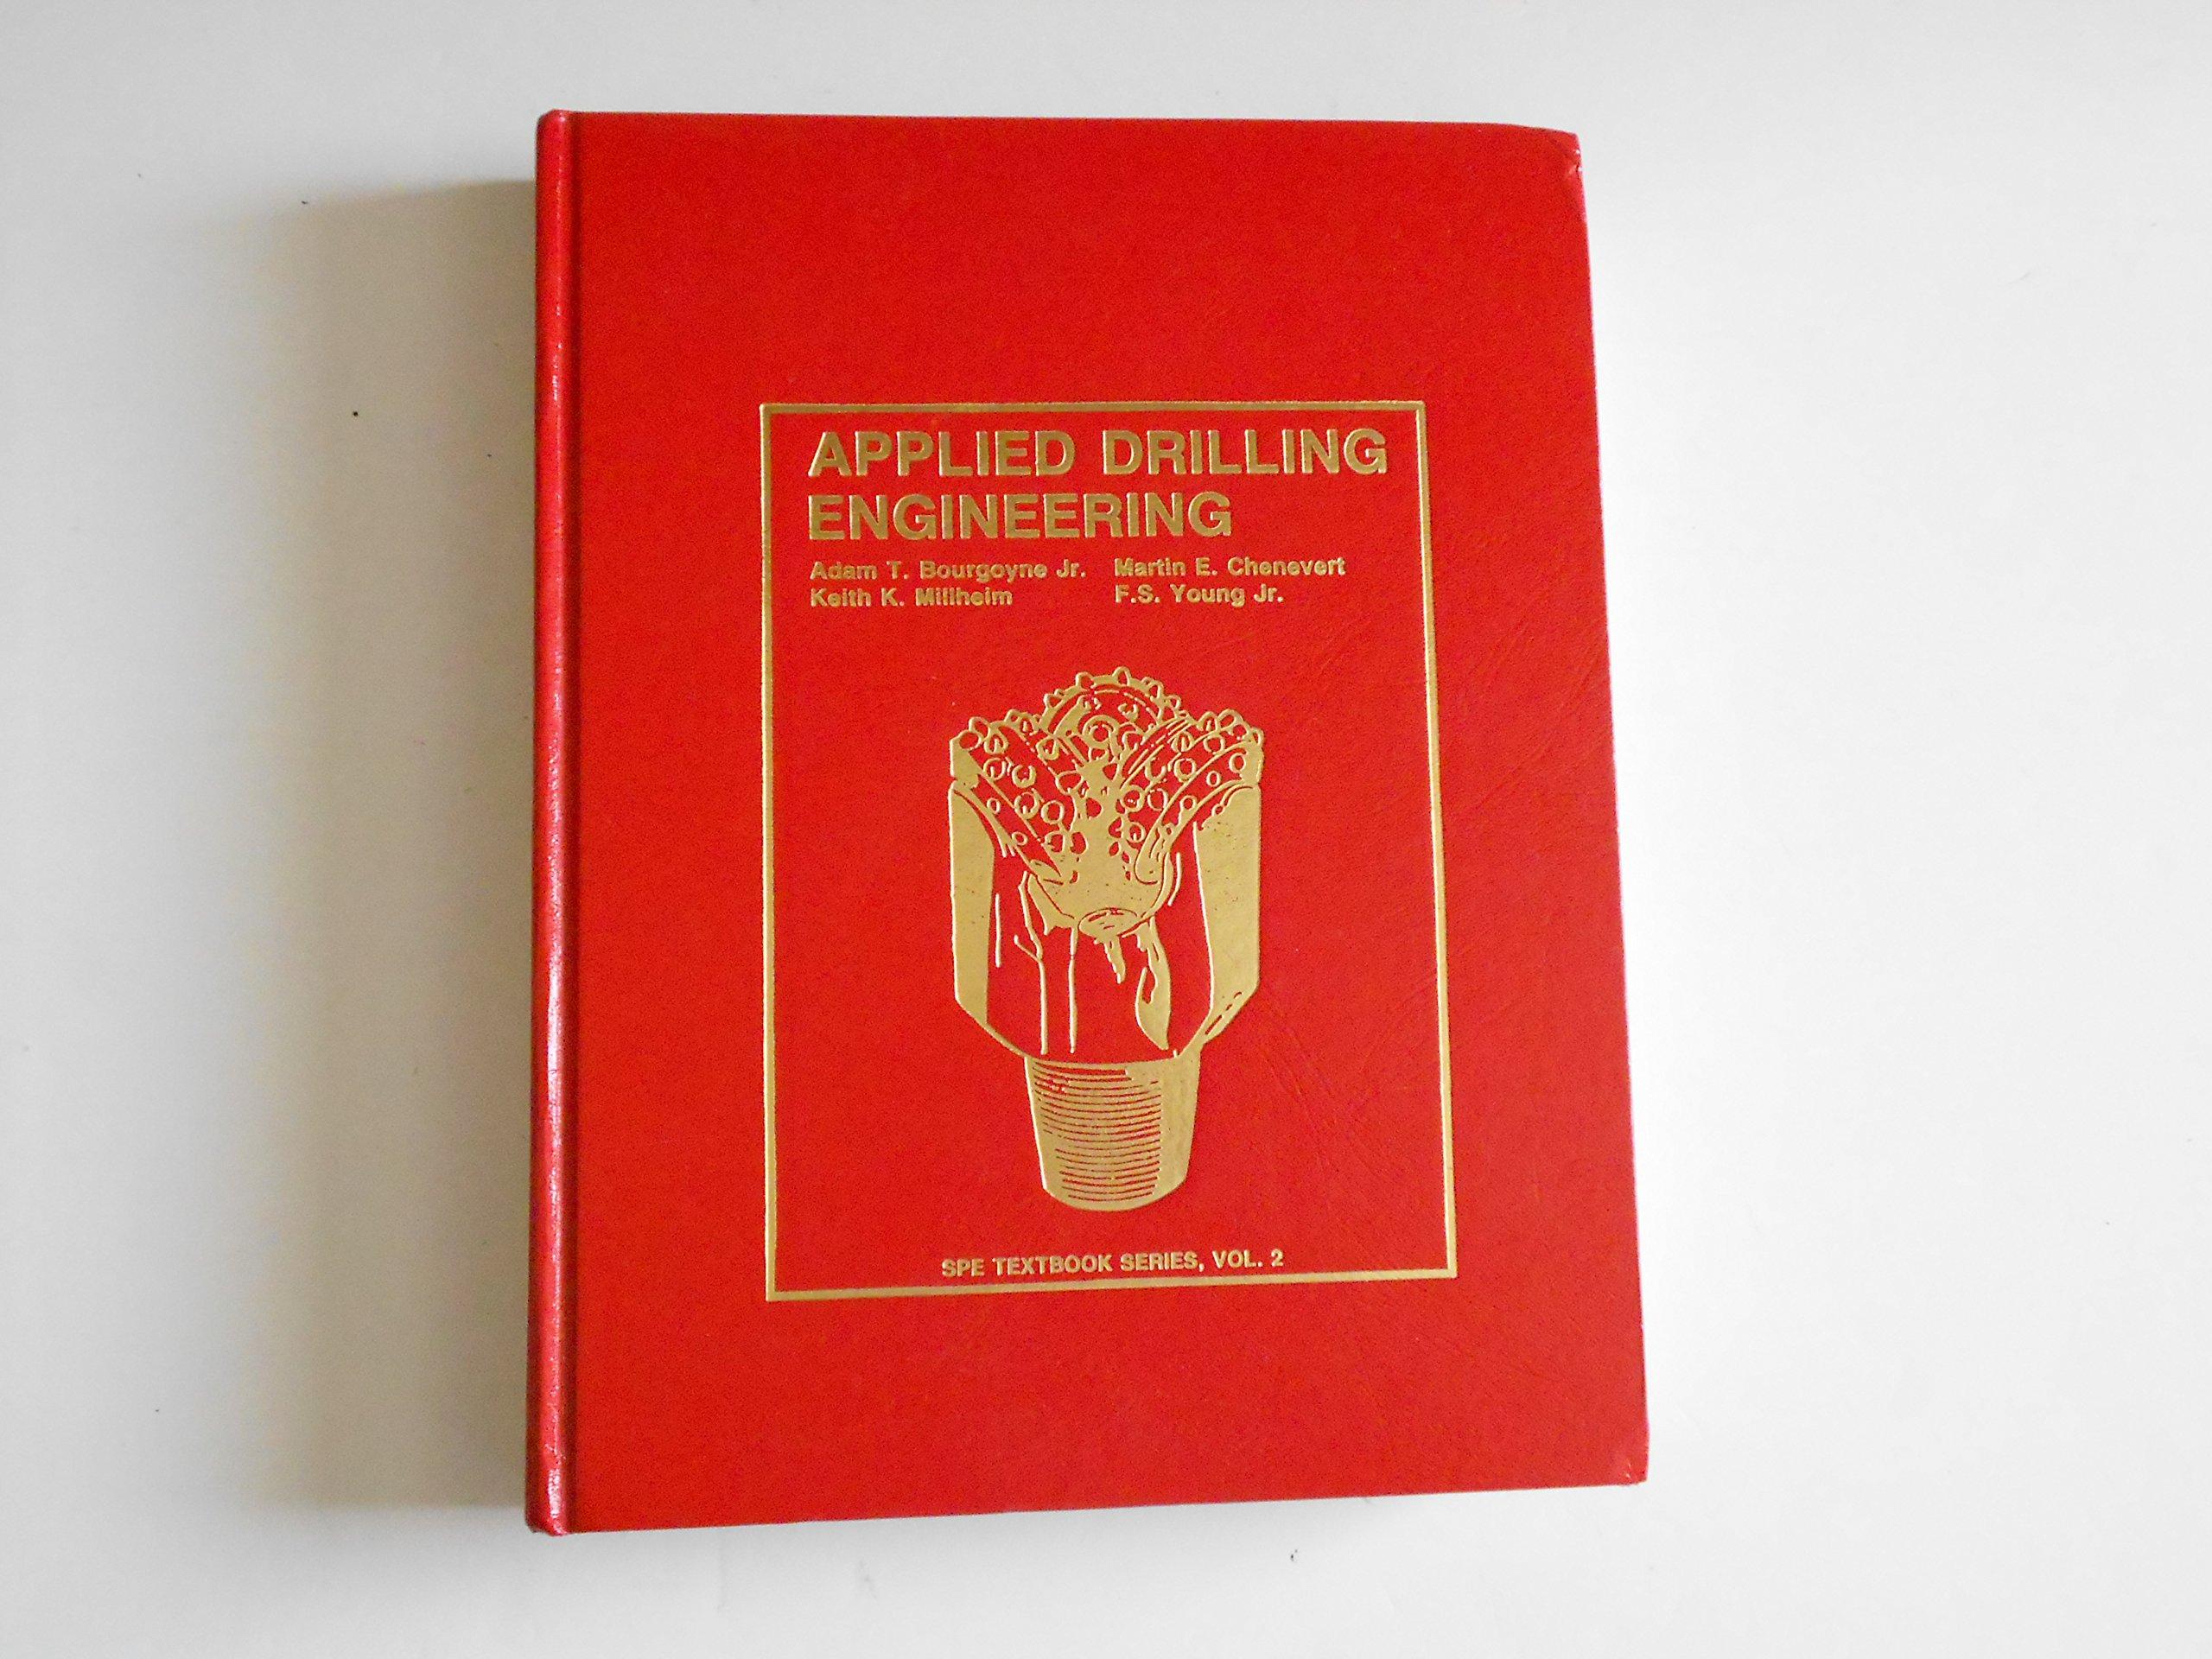 Applied Drilling Engineering (Spe Textbook Series, Vol 2)